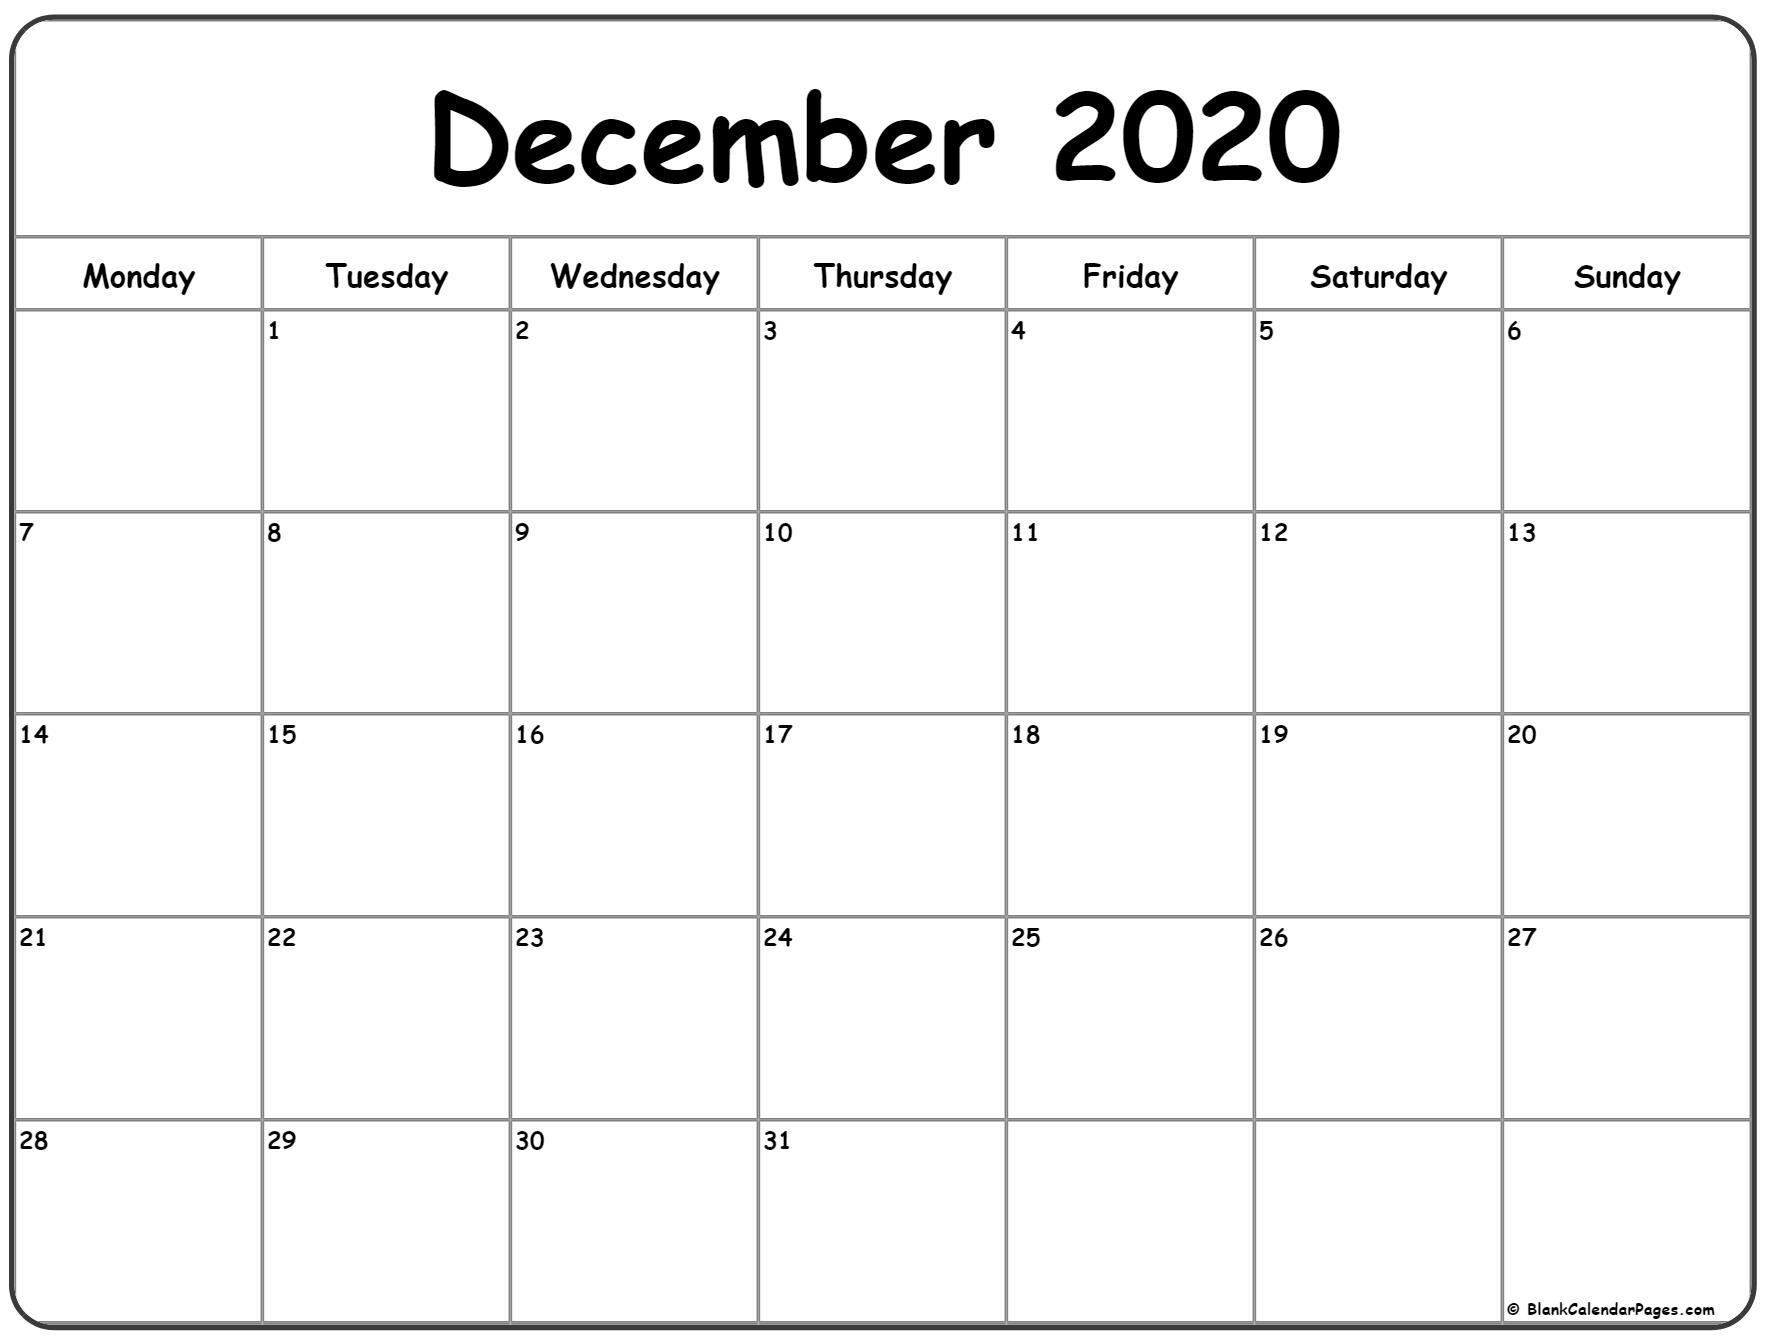 December 2020 Monday Calendar | Monday To Sunday in Calander December 2020